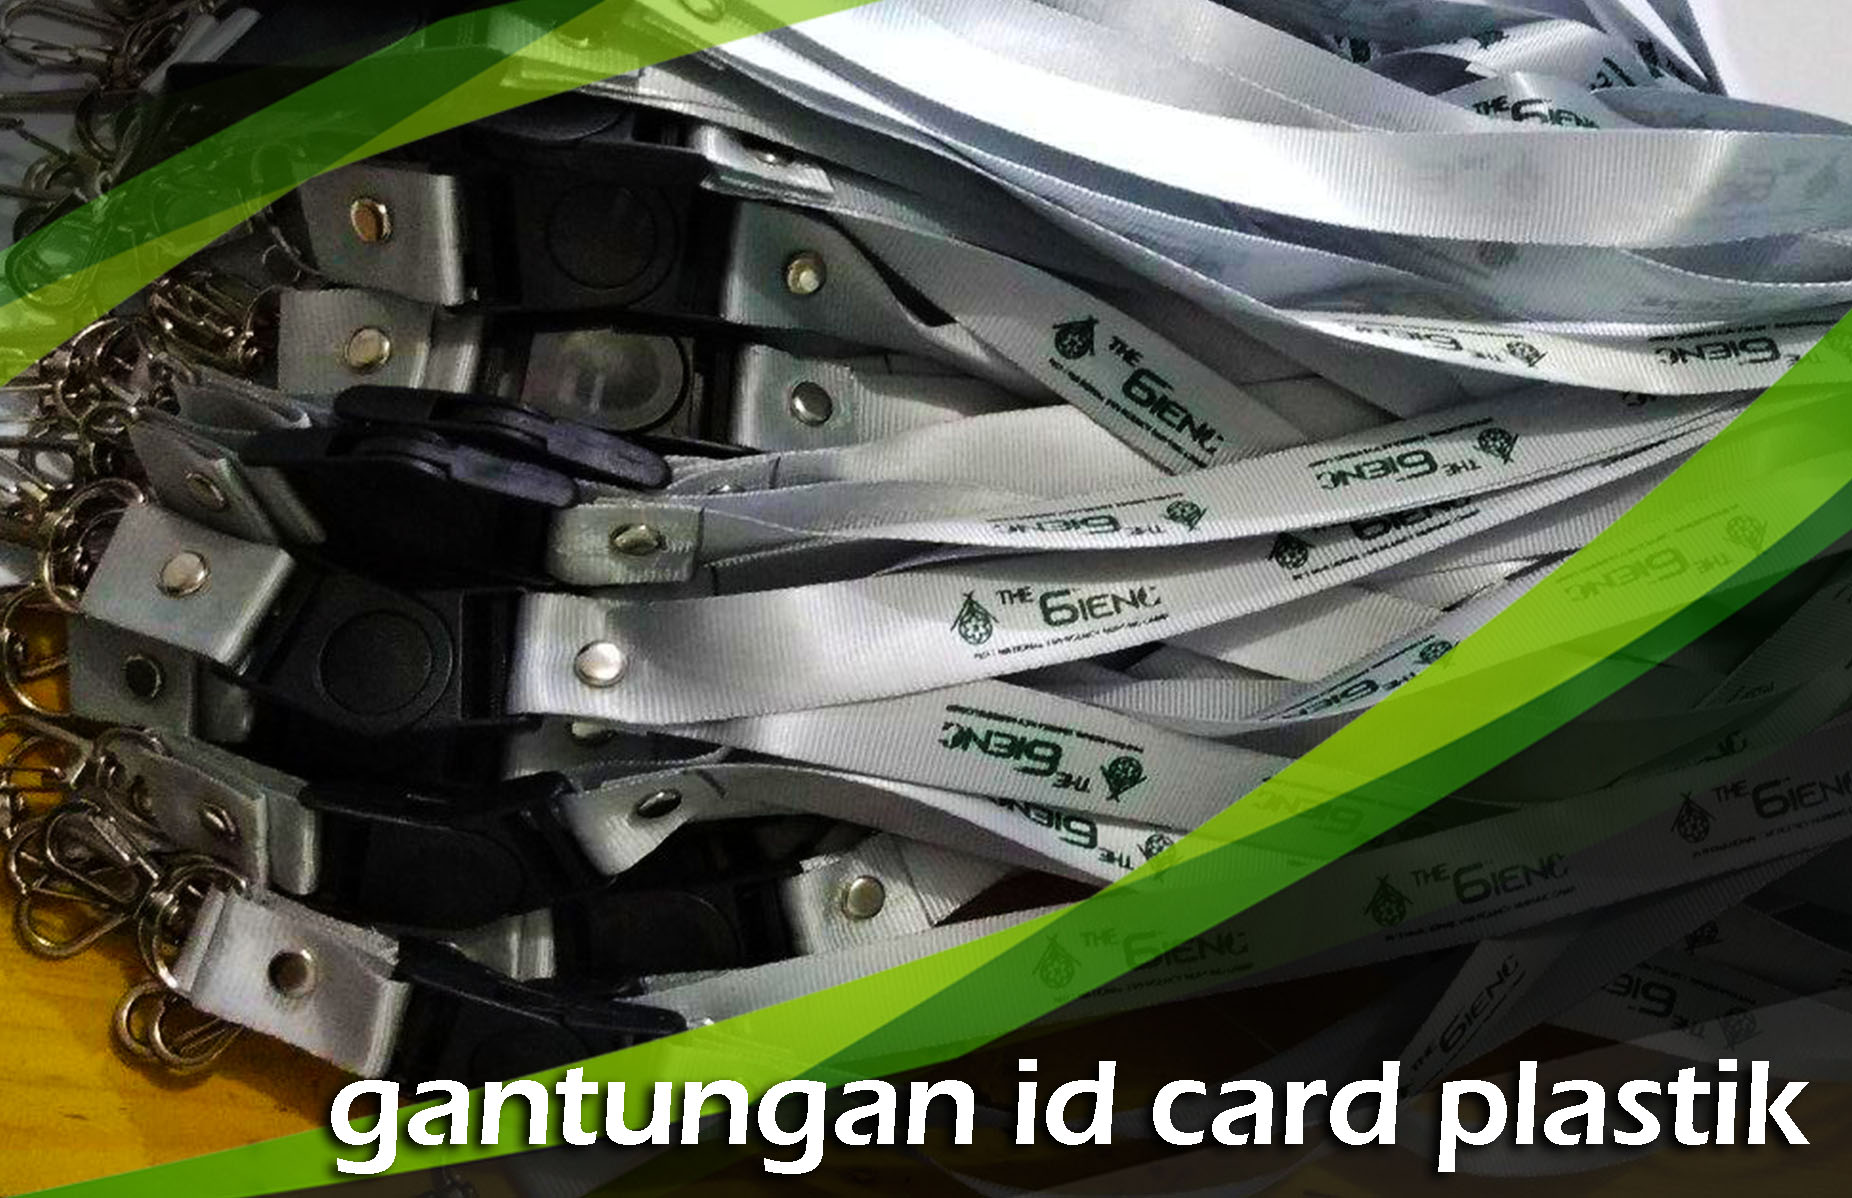 Gantungan ID Card Plastik